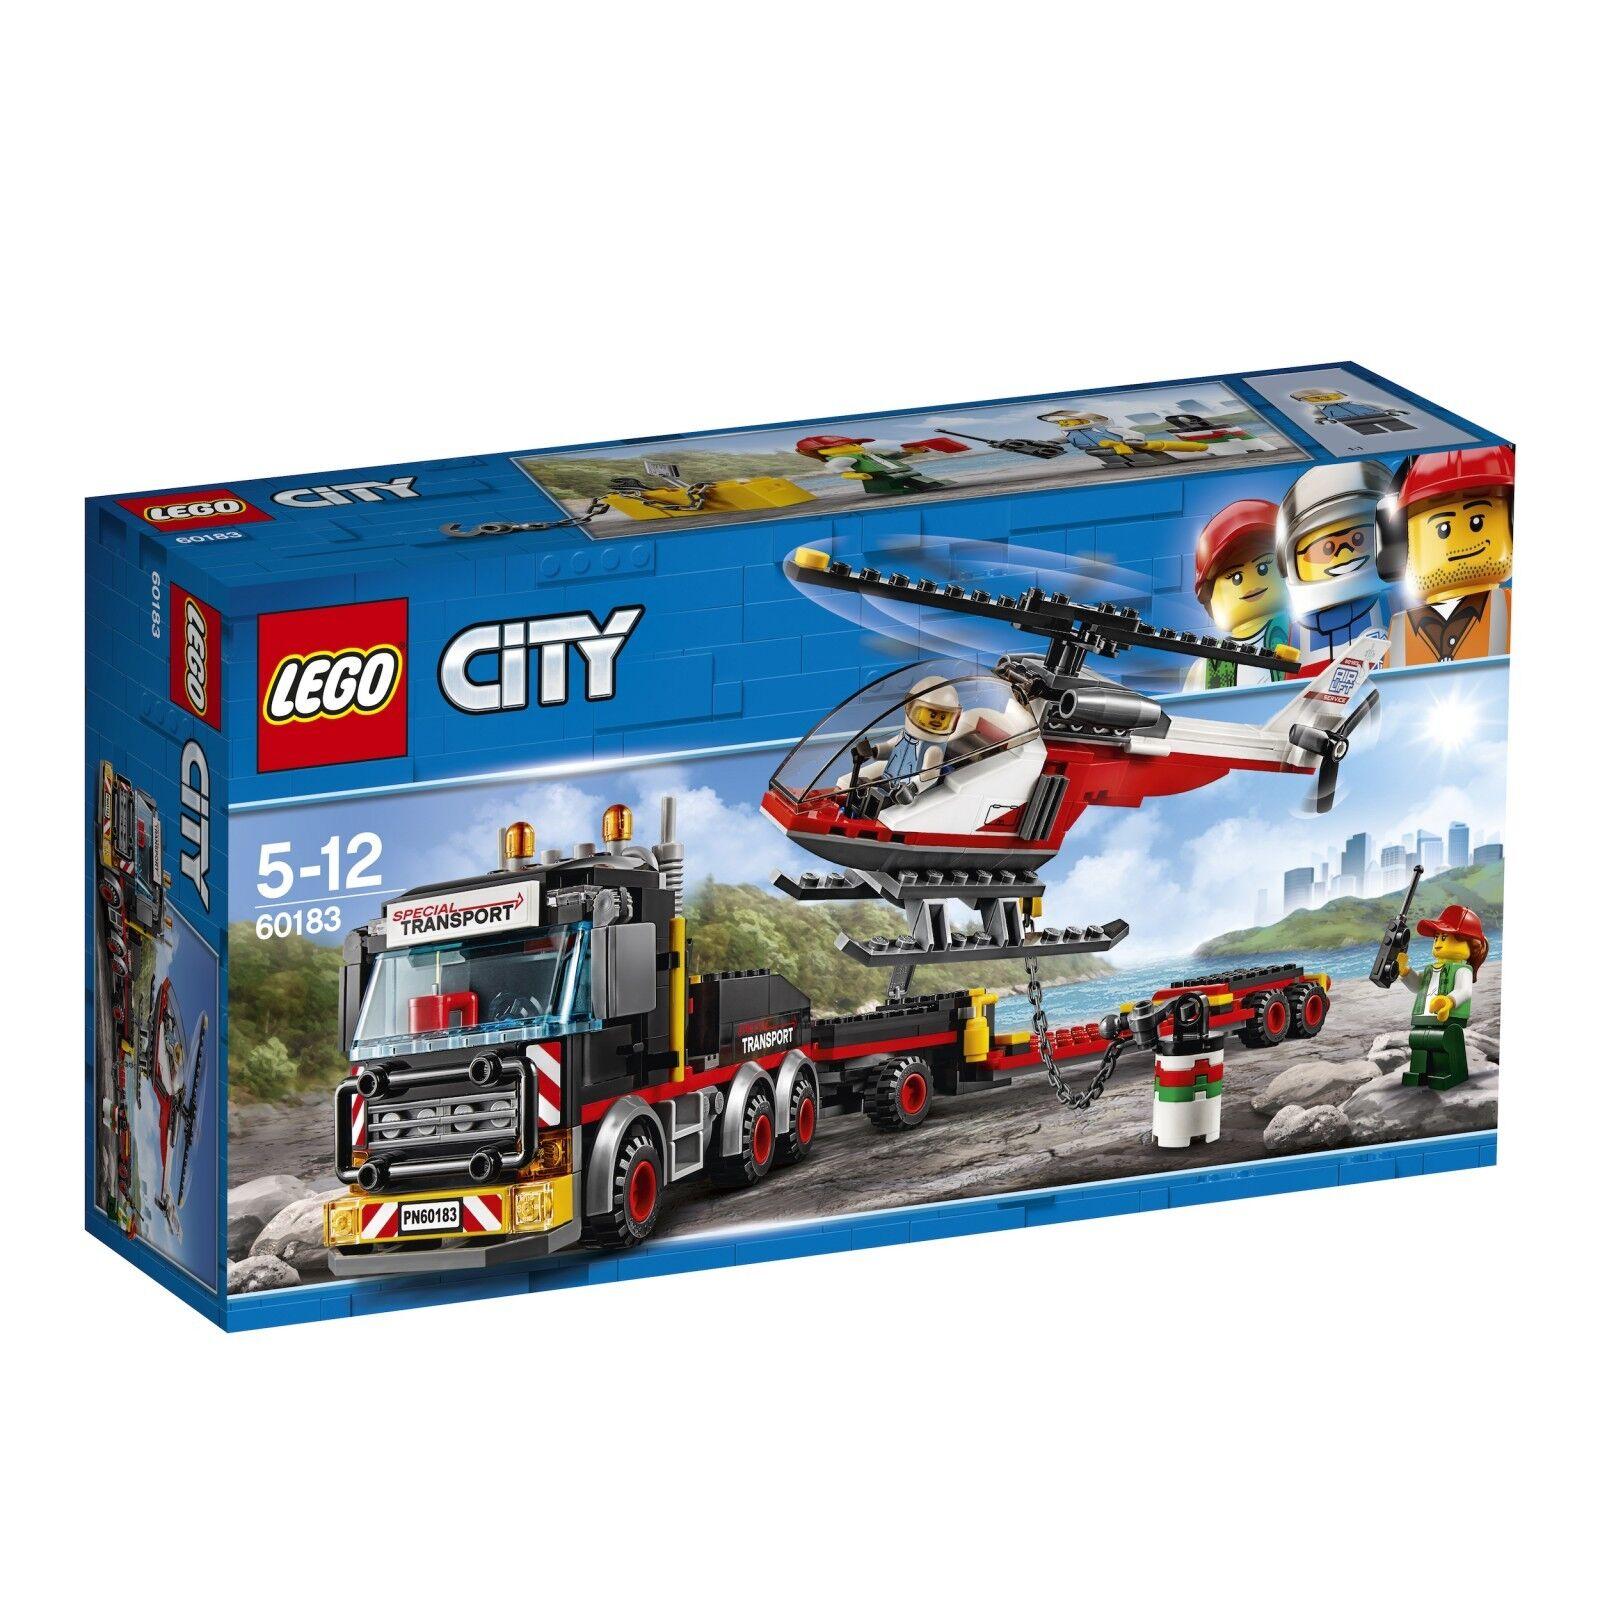 LEGO ® City 60183 pesanti Transporter Nuovo OVP _ Heavy Cargo trasporto NEW MISB